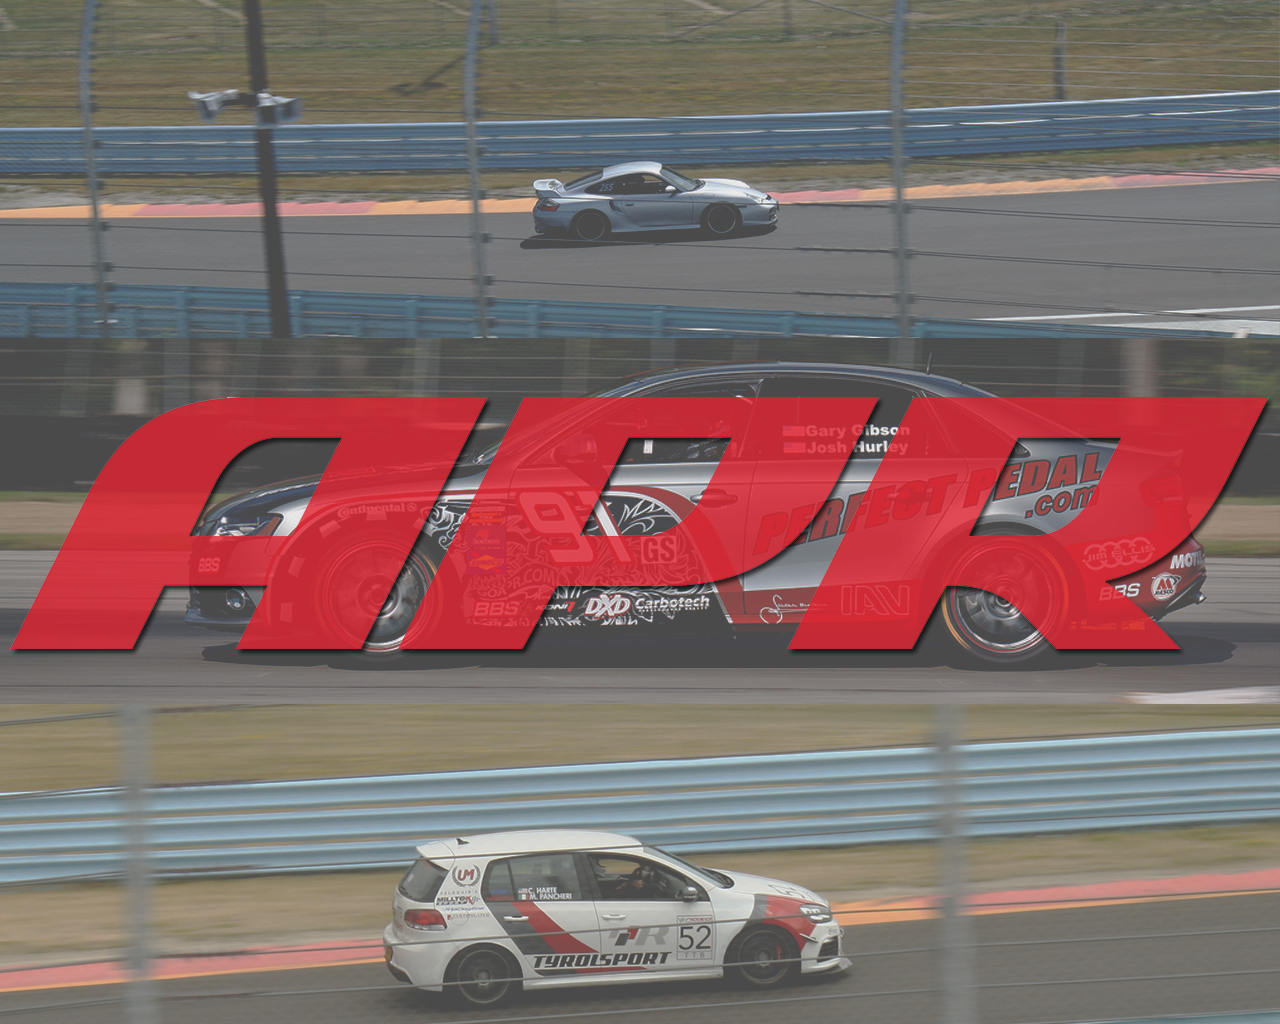 APR, GIAC, Burger Motorsport, JHM, Manic MotorSport, United